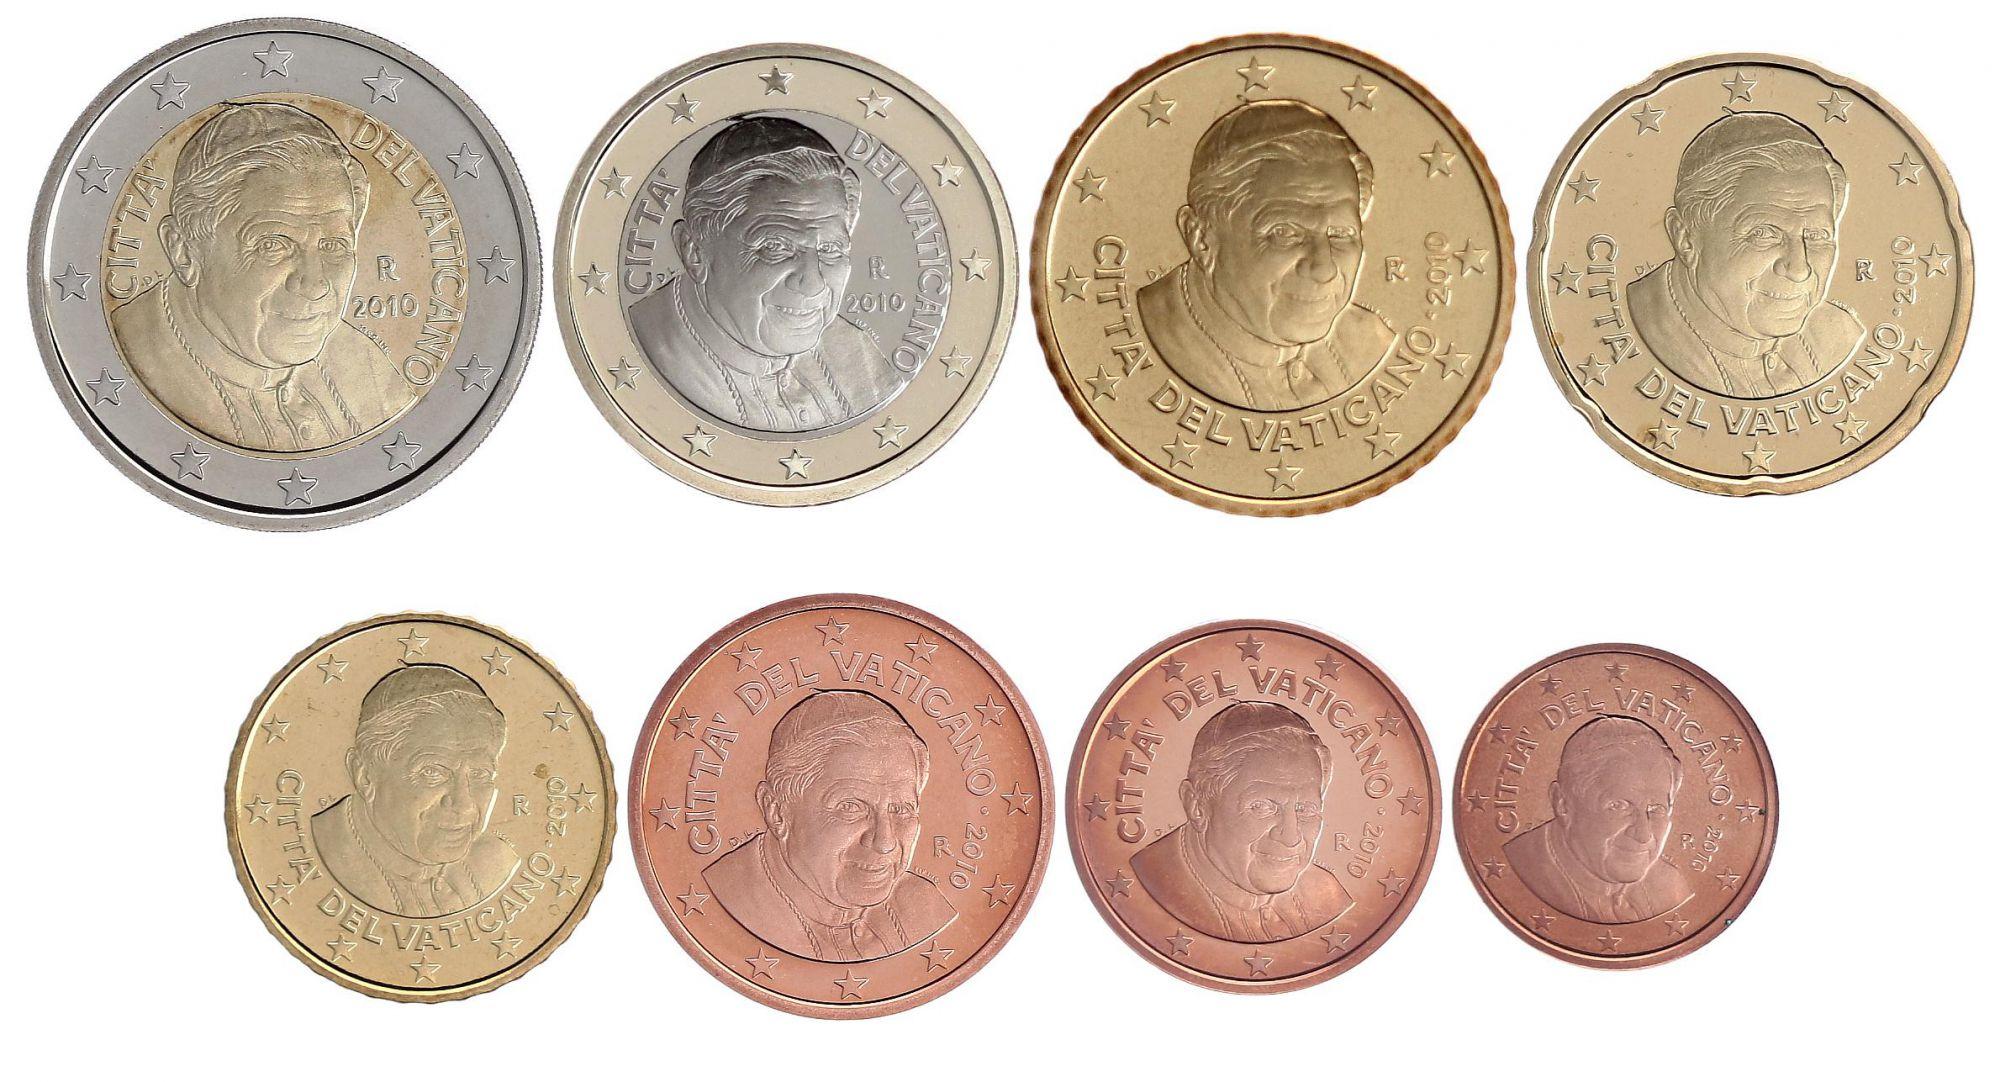 Vatican City State Set of 8 coins 2010 - Benoit XVI - Proof